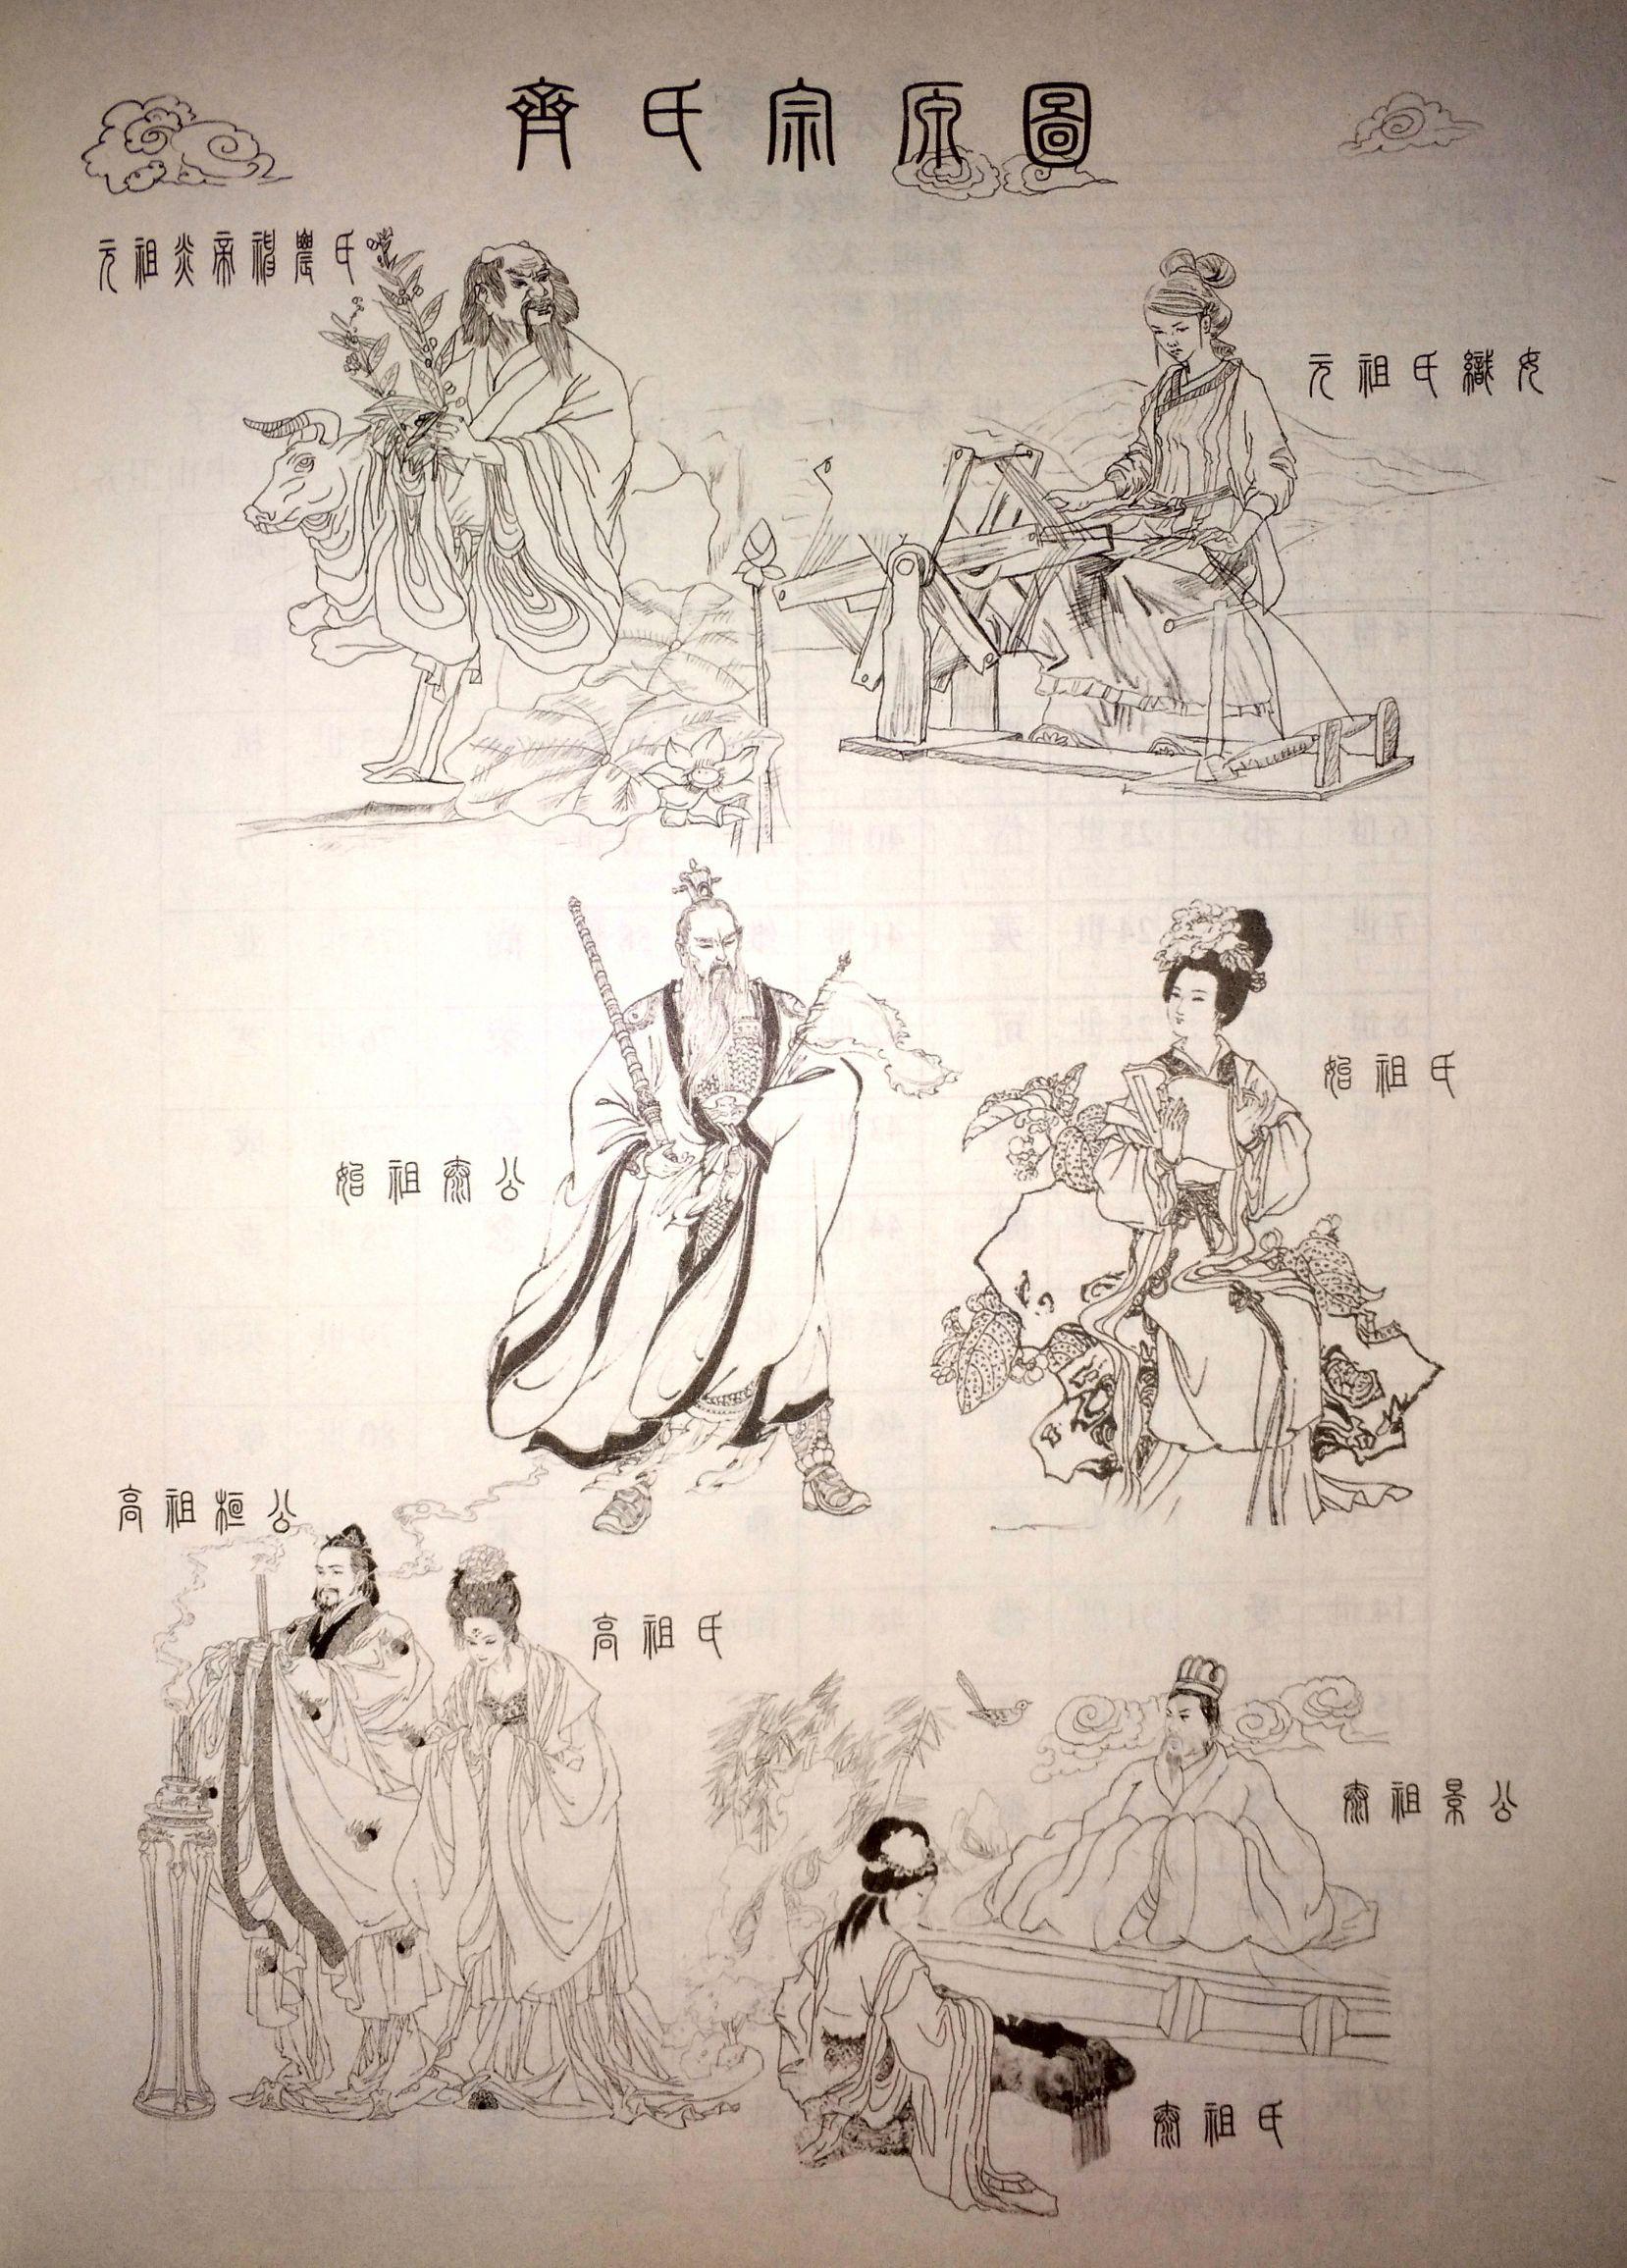 齐氏宗谱世系表